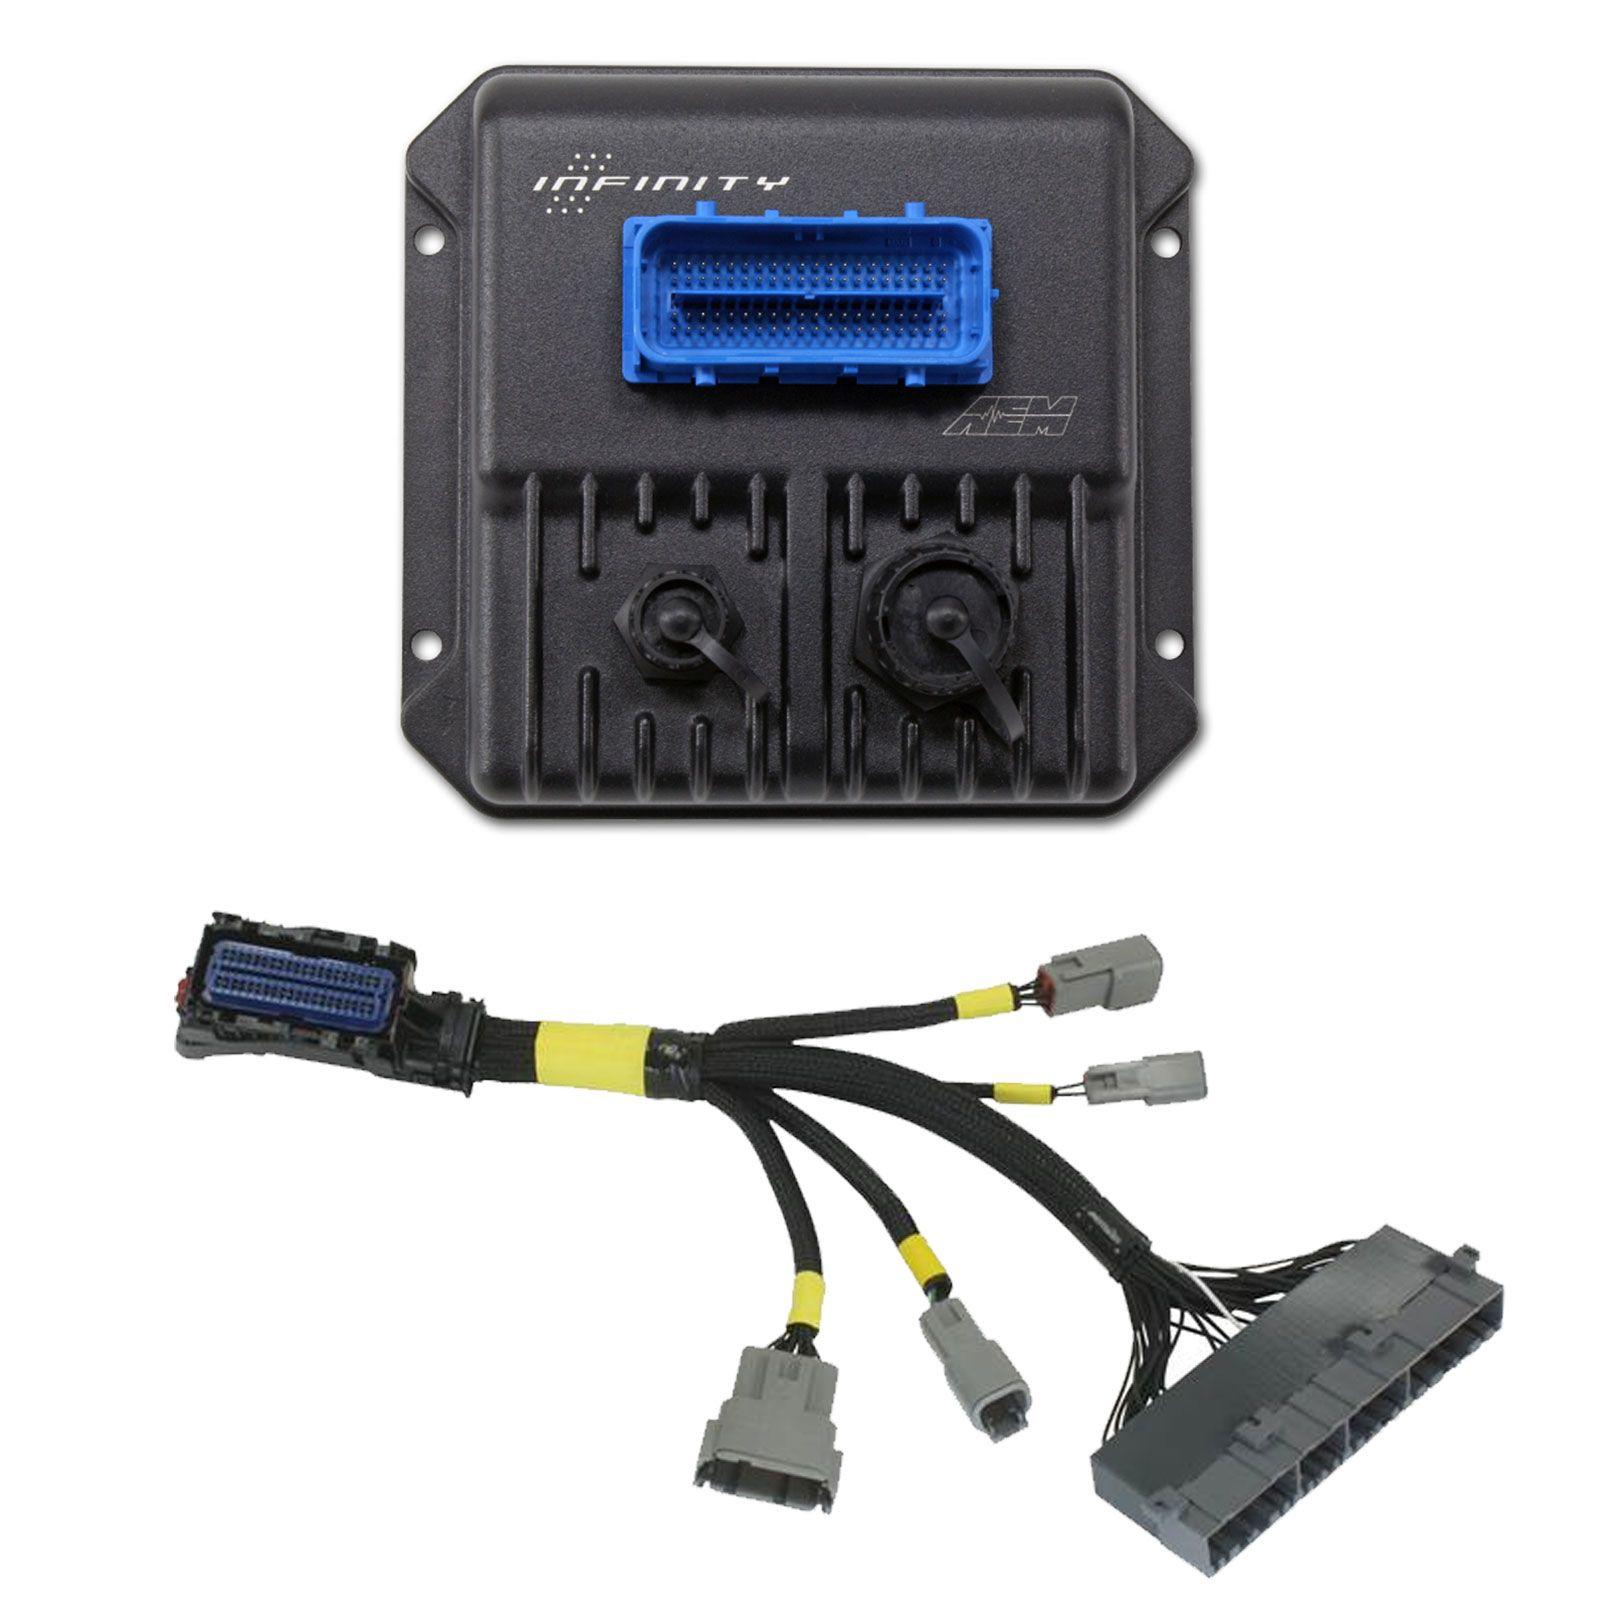 AEM Infinity 506 EMS CPU with Plug N Play Harness for 2003-05 Mitsubishi Evo 8